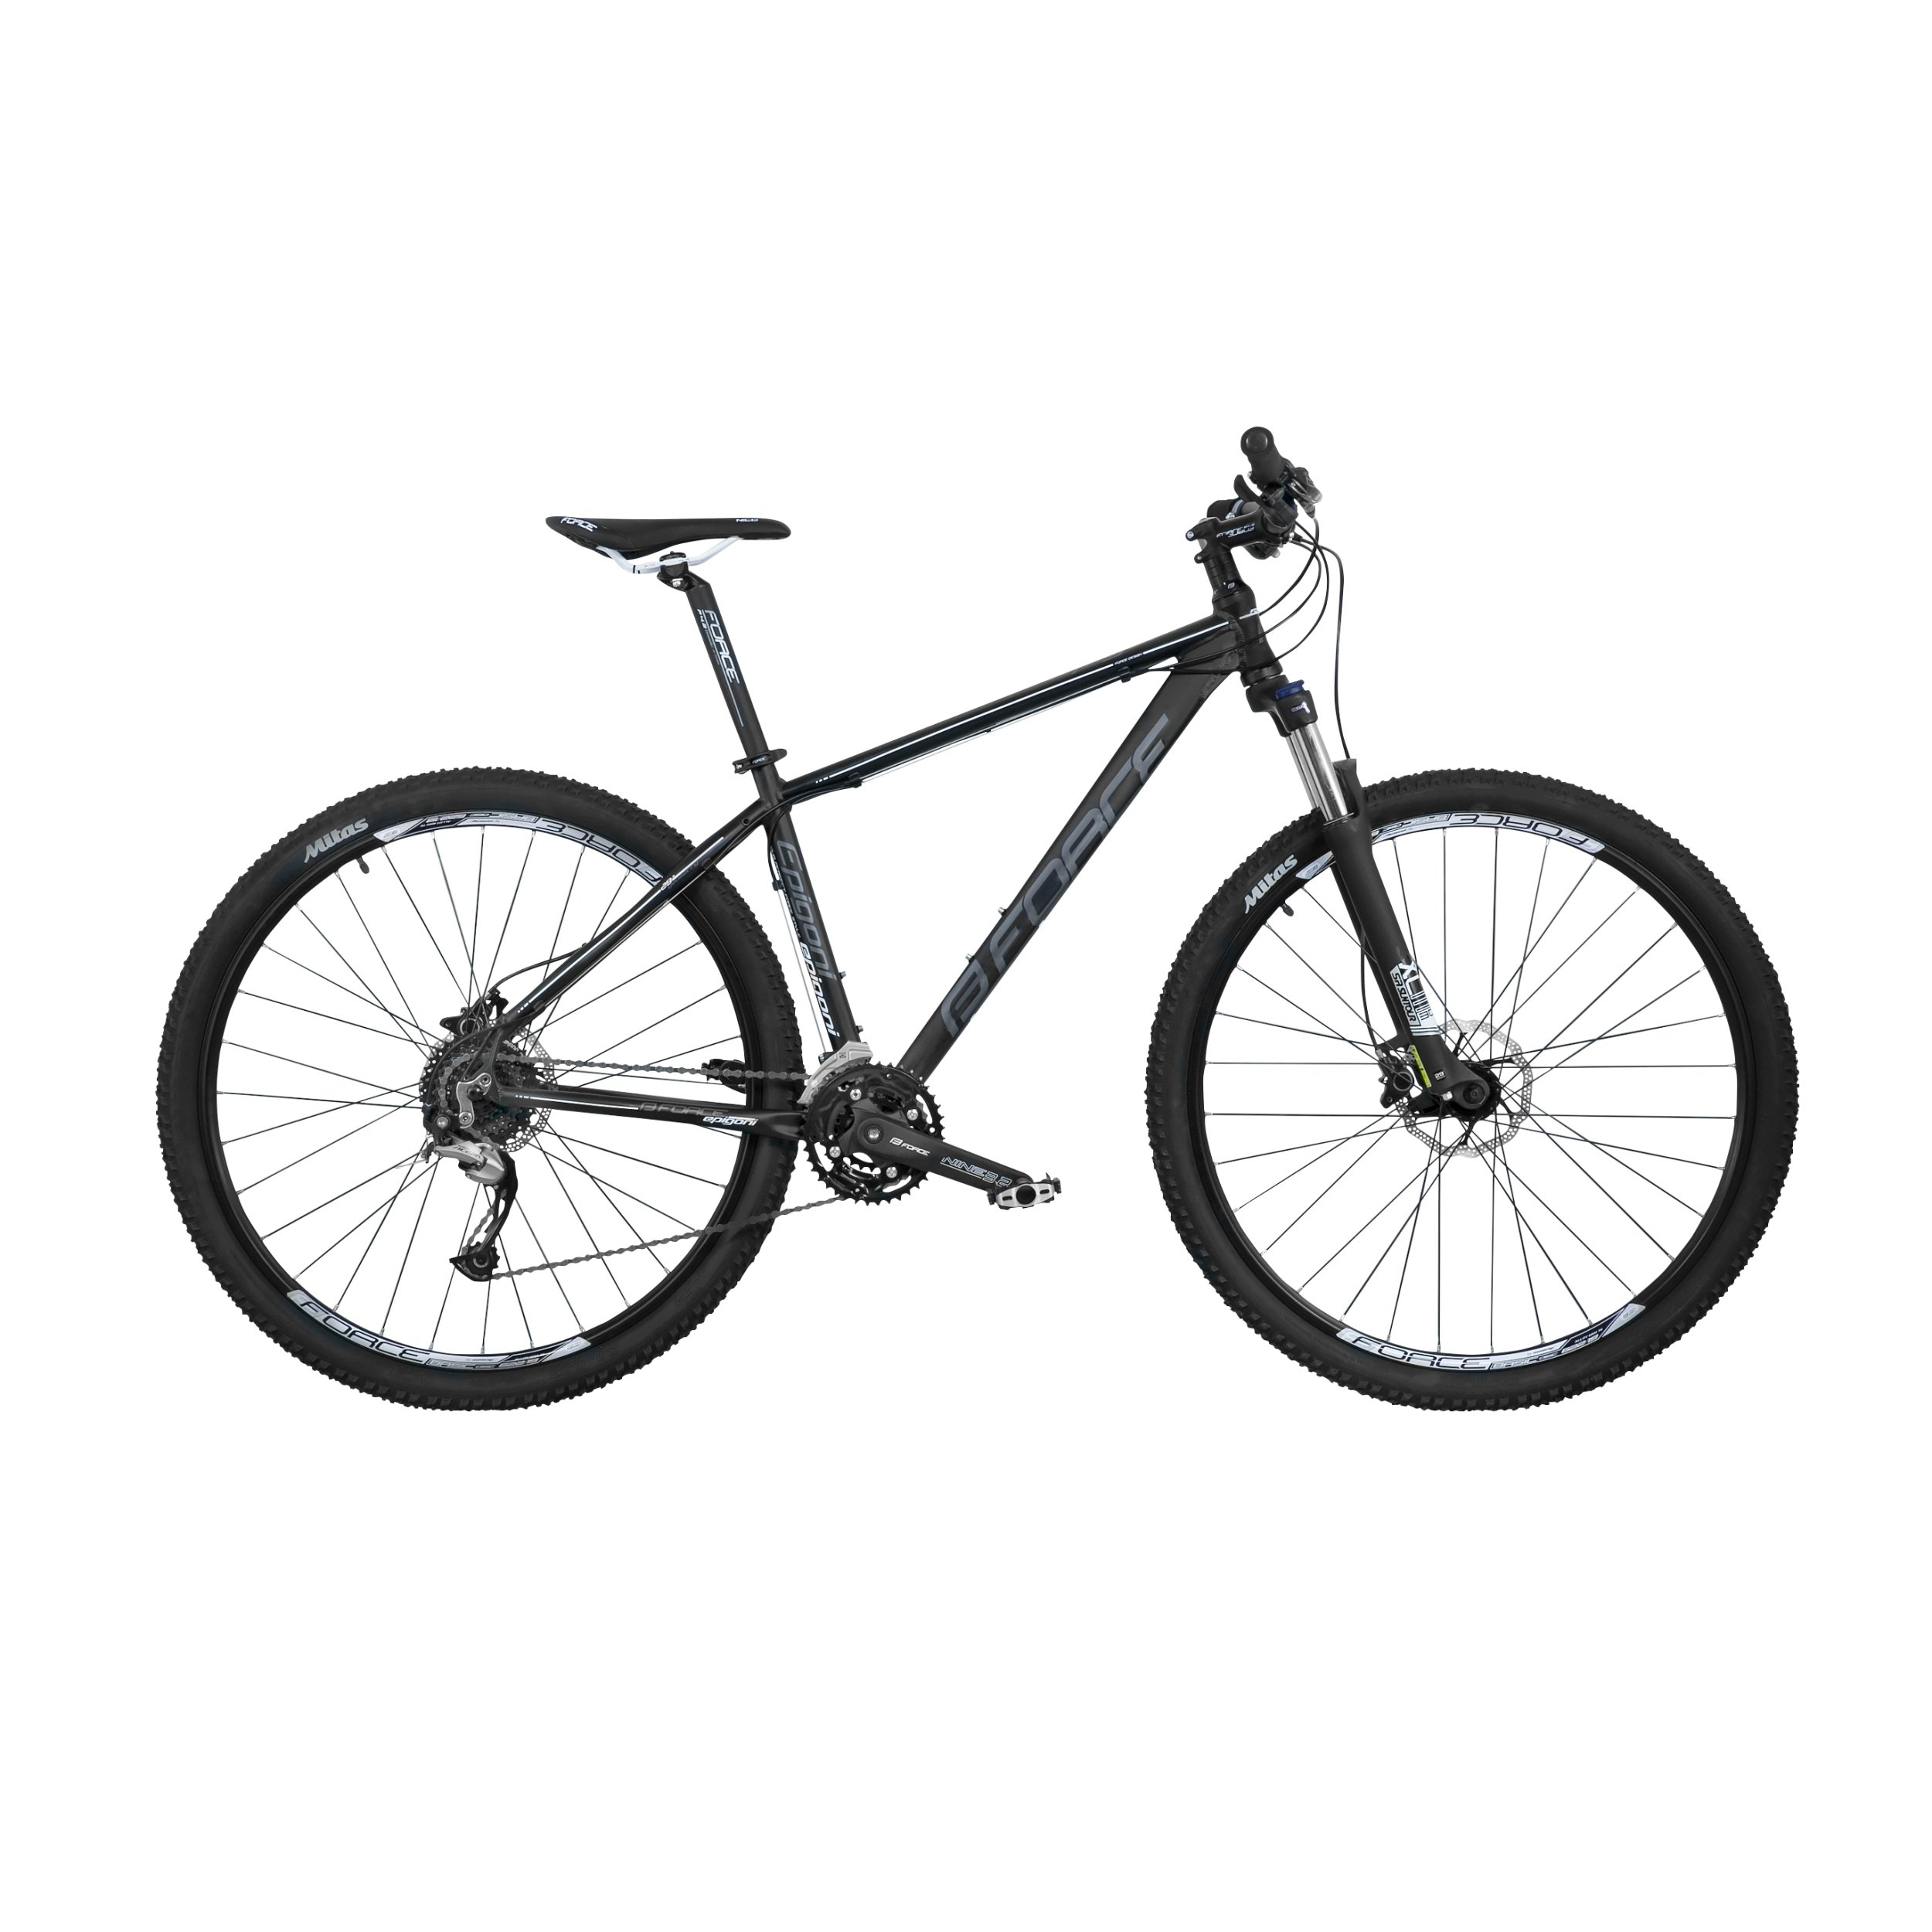 Force Epigoni 29 27gear - Sort/hvid | Mountainbikes